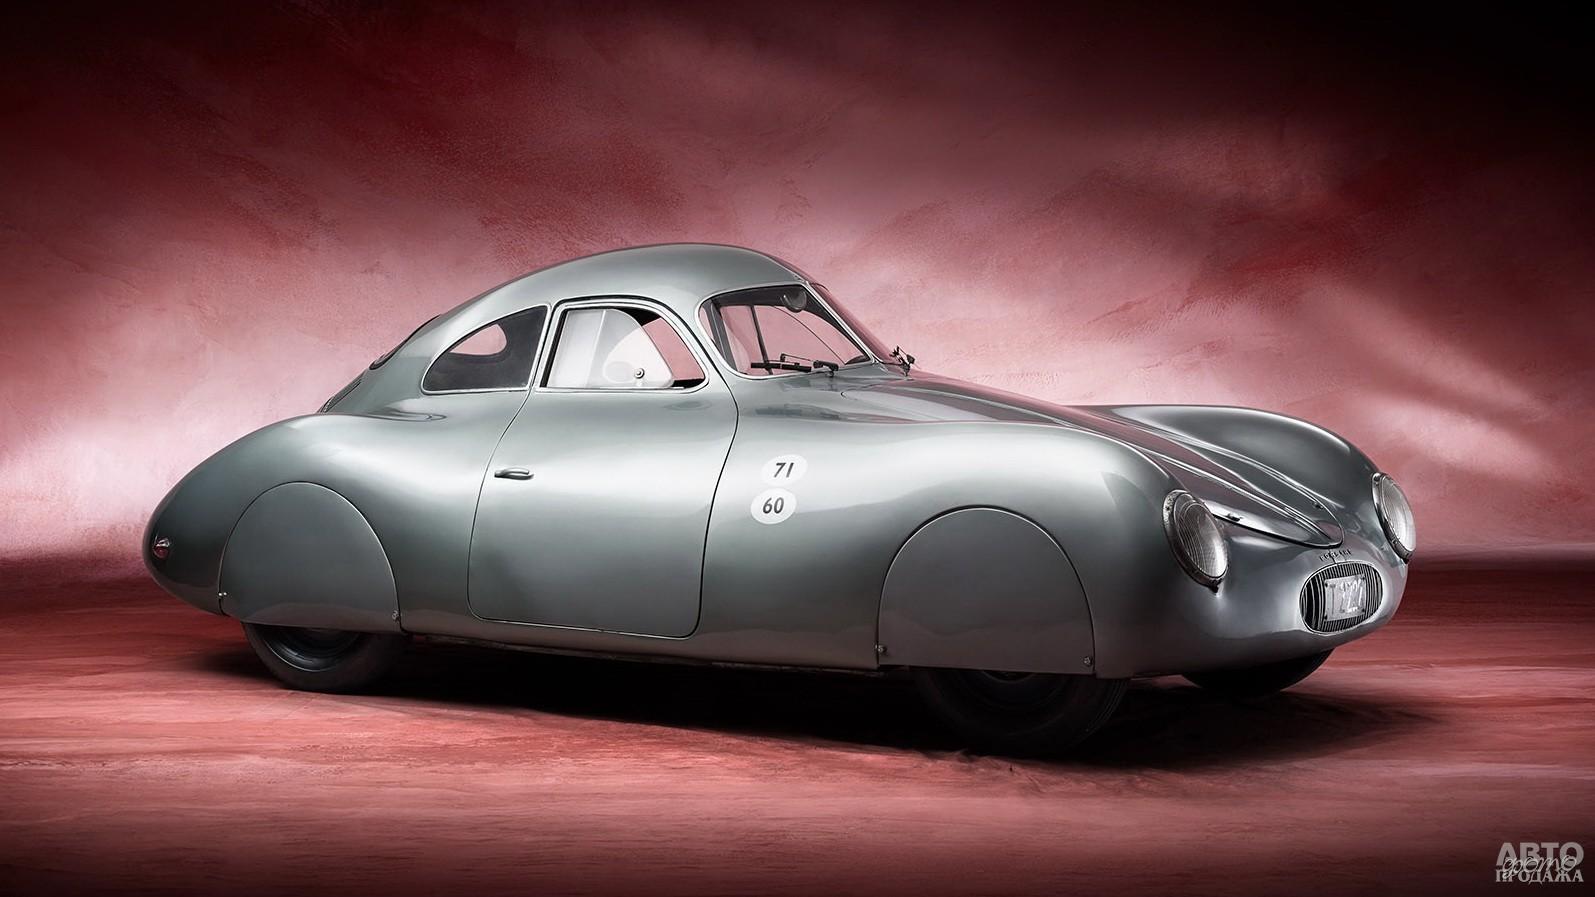 Прототип Тур 64 1940 года – предшественник Pоrsche 356